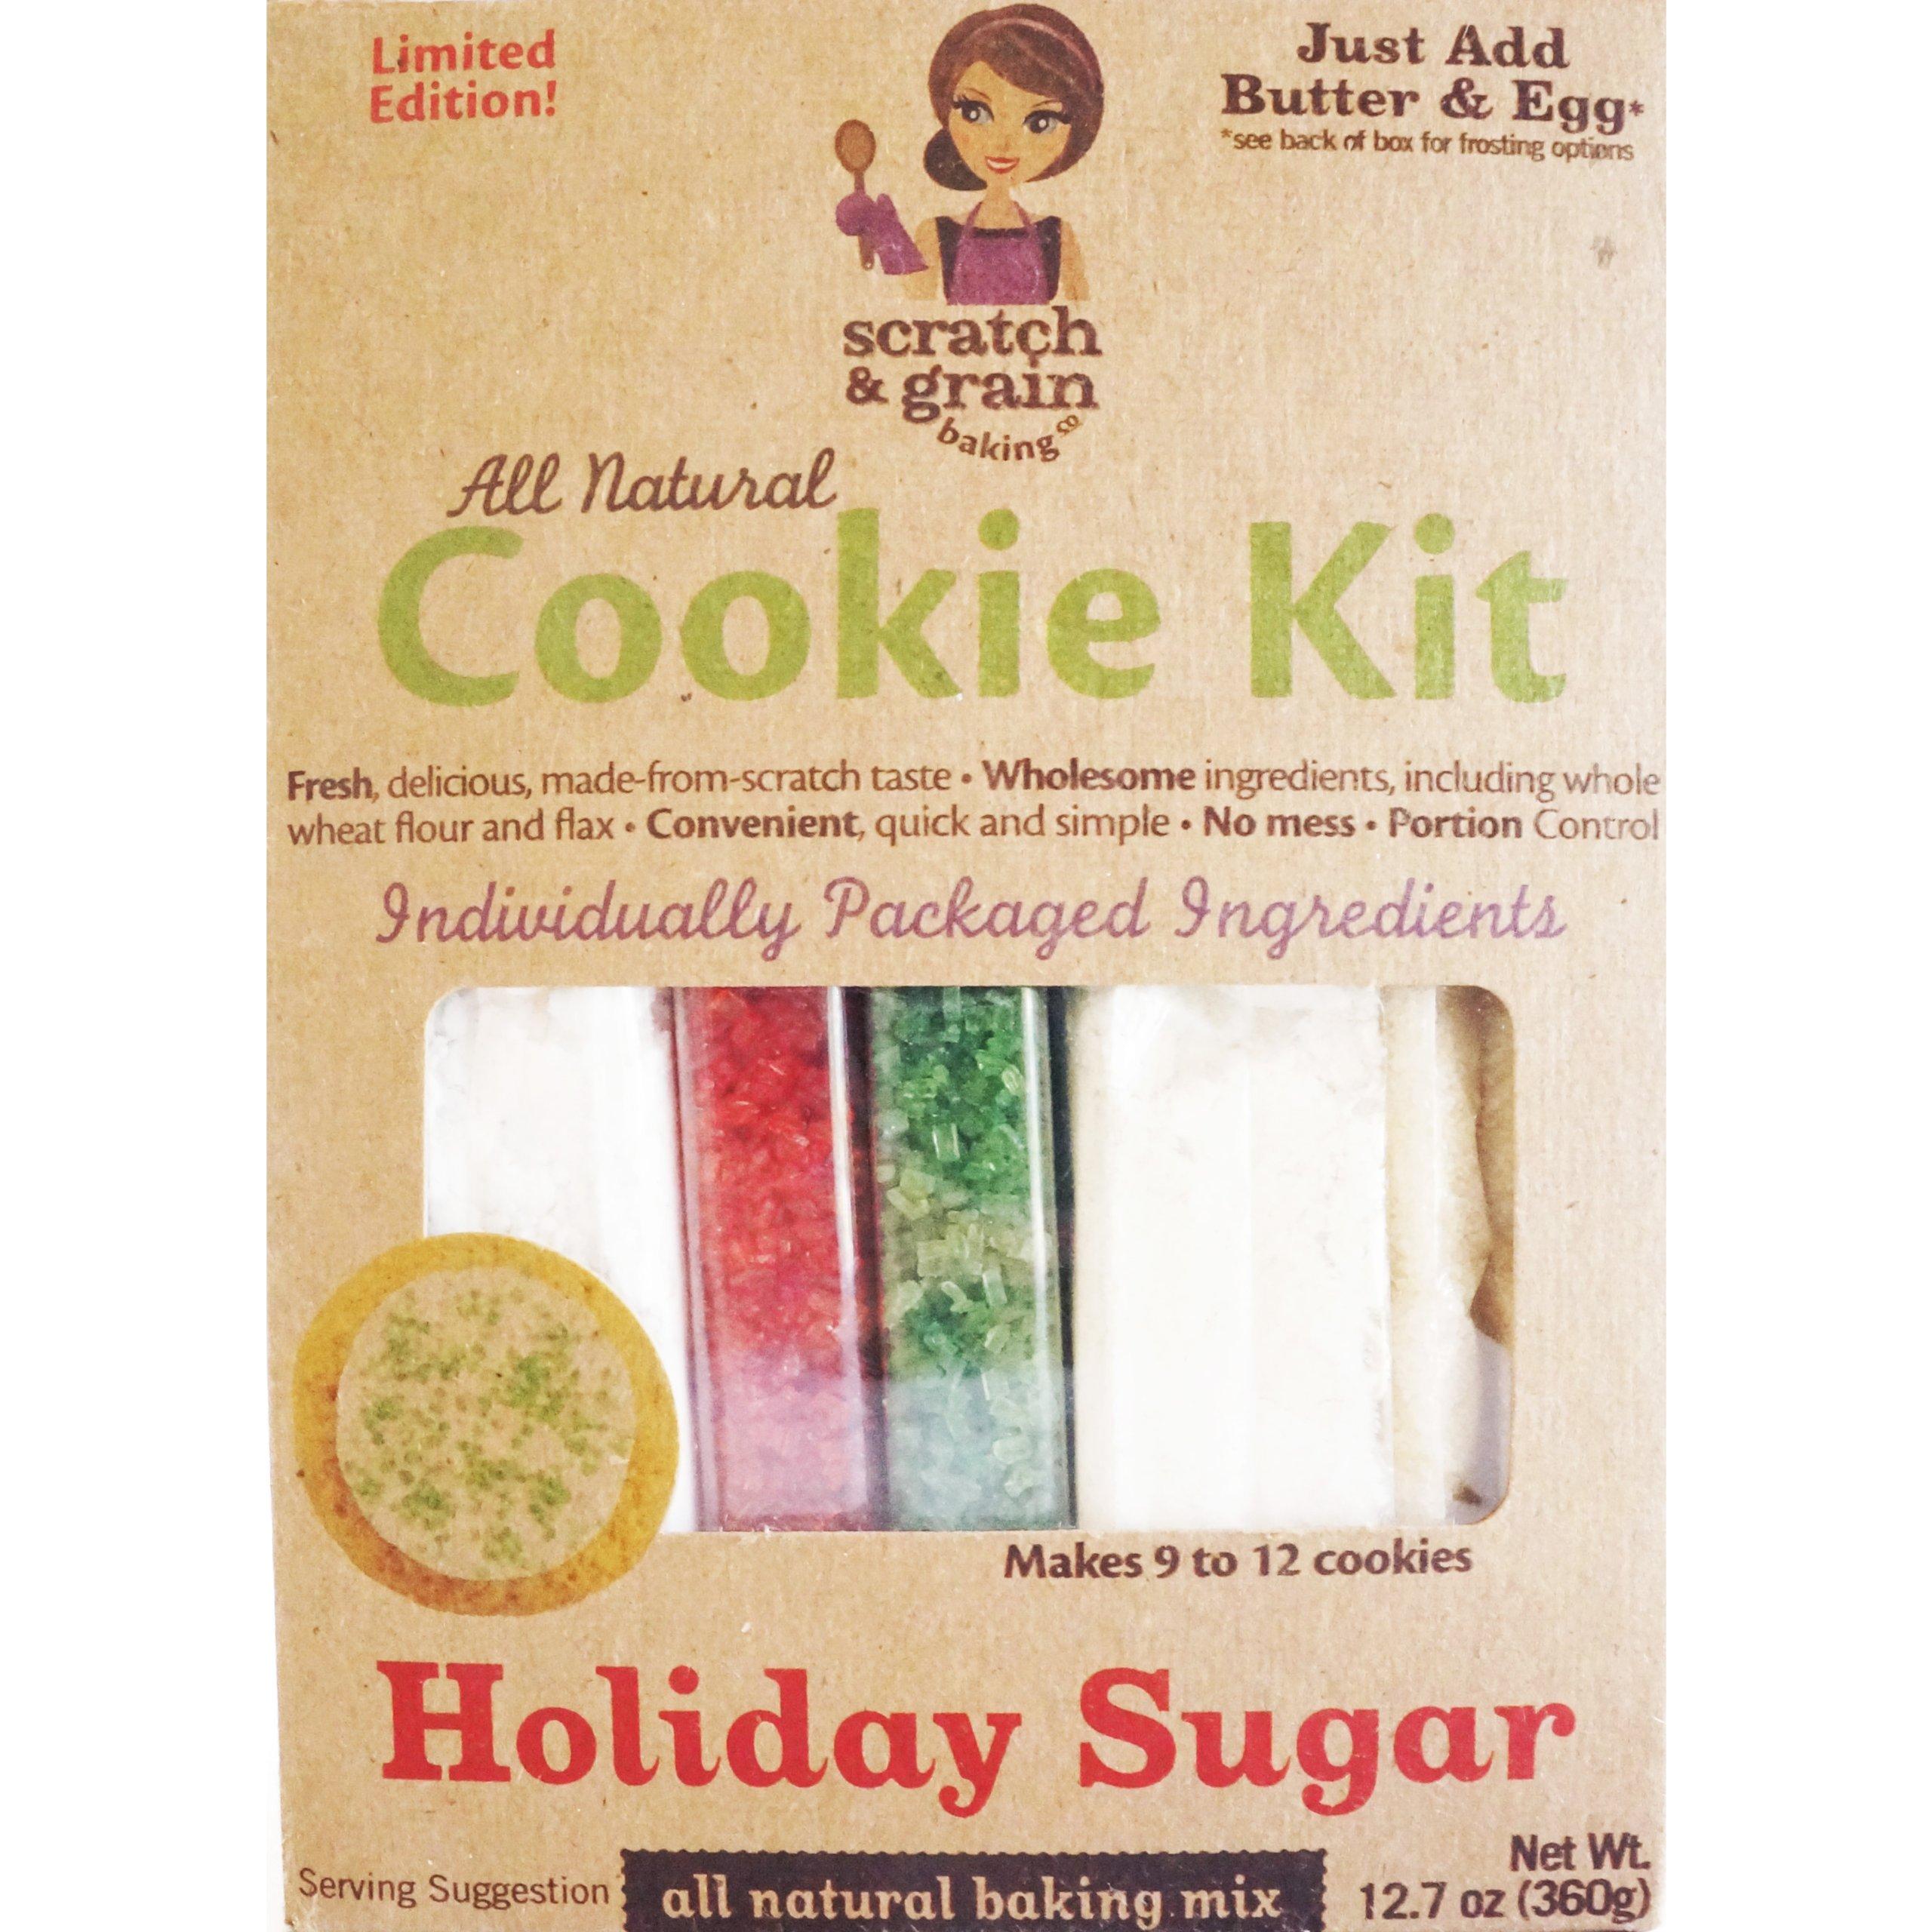 Scratch & Grain Baking Company Organic Holiday Sugar Cookie Kit